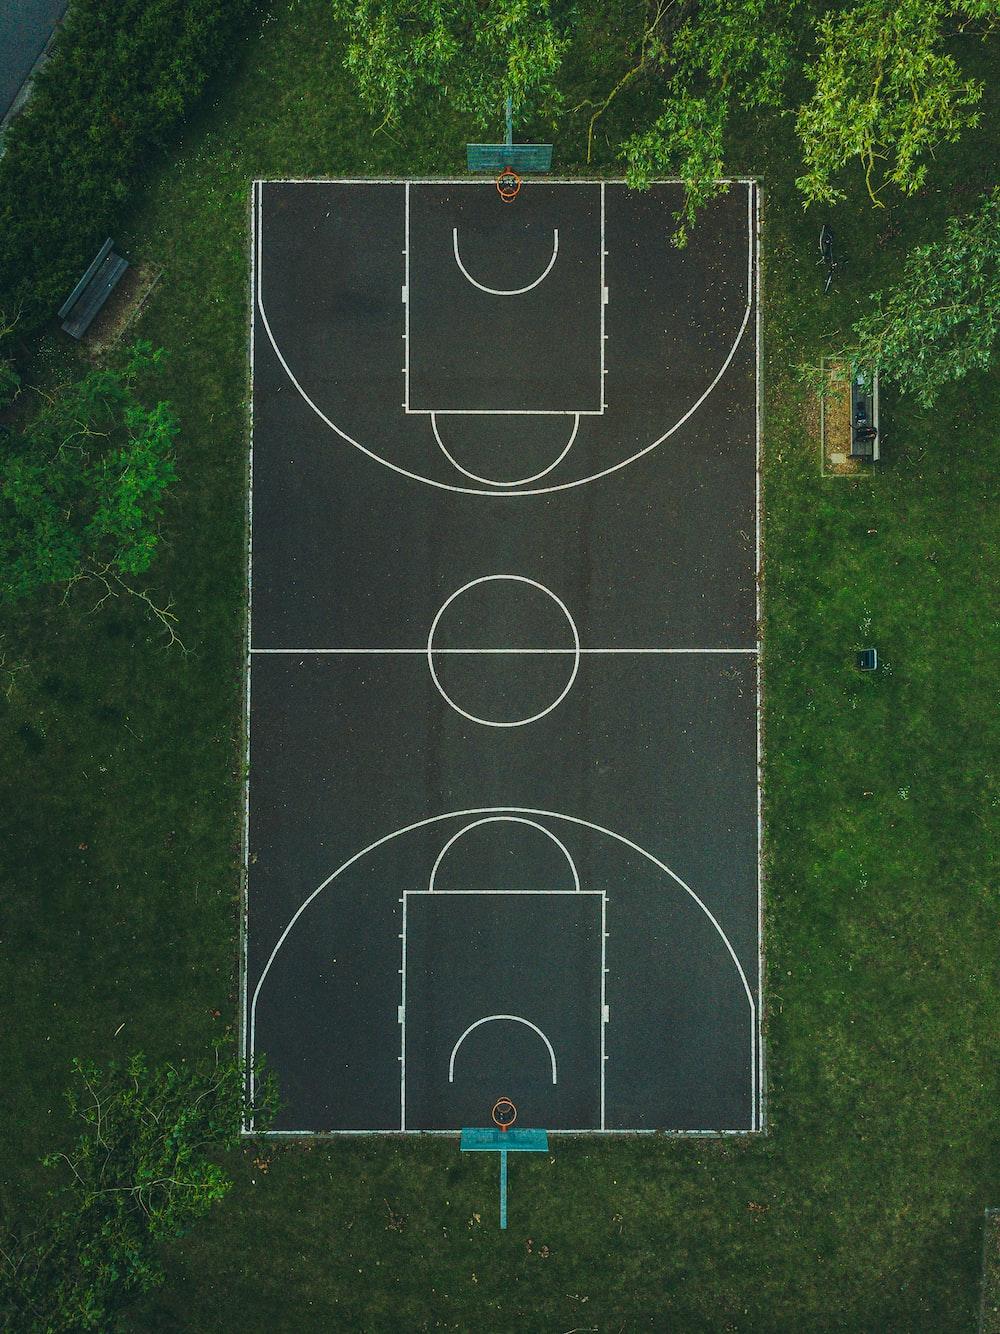 basketball court between trees